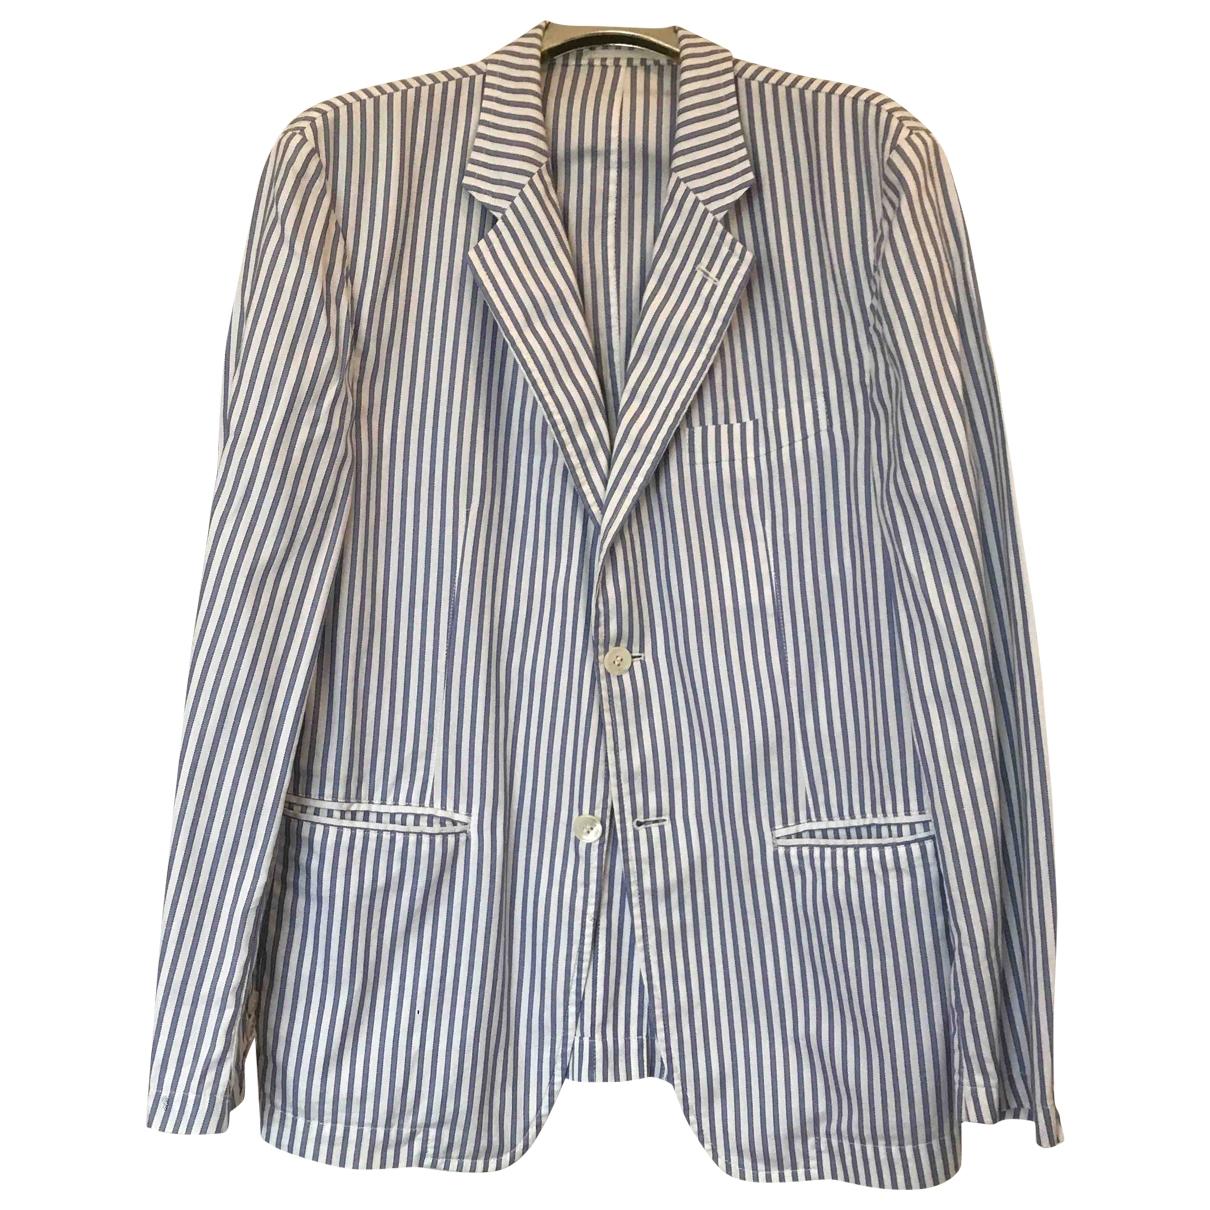 Comme Des Garcons \N Blue Cotton jacket  for Men L International